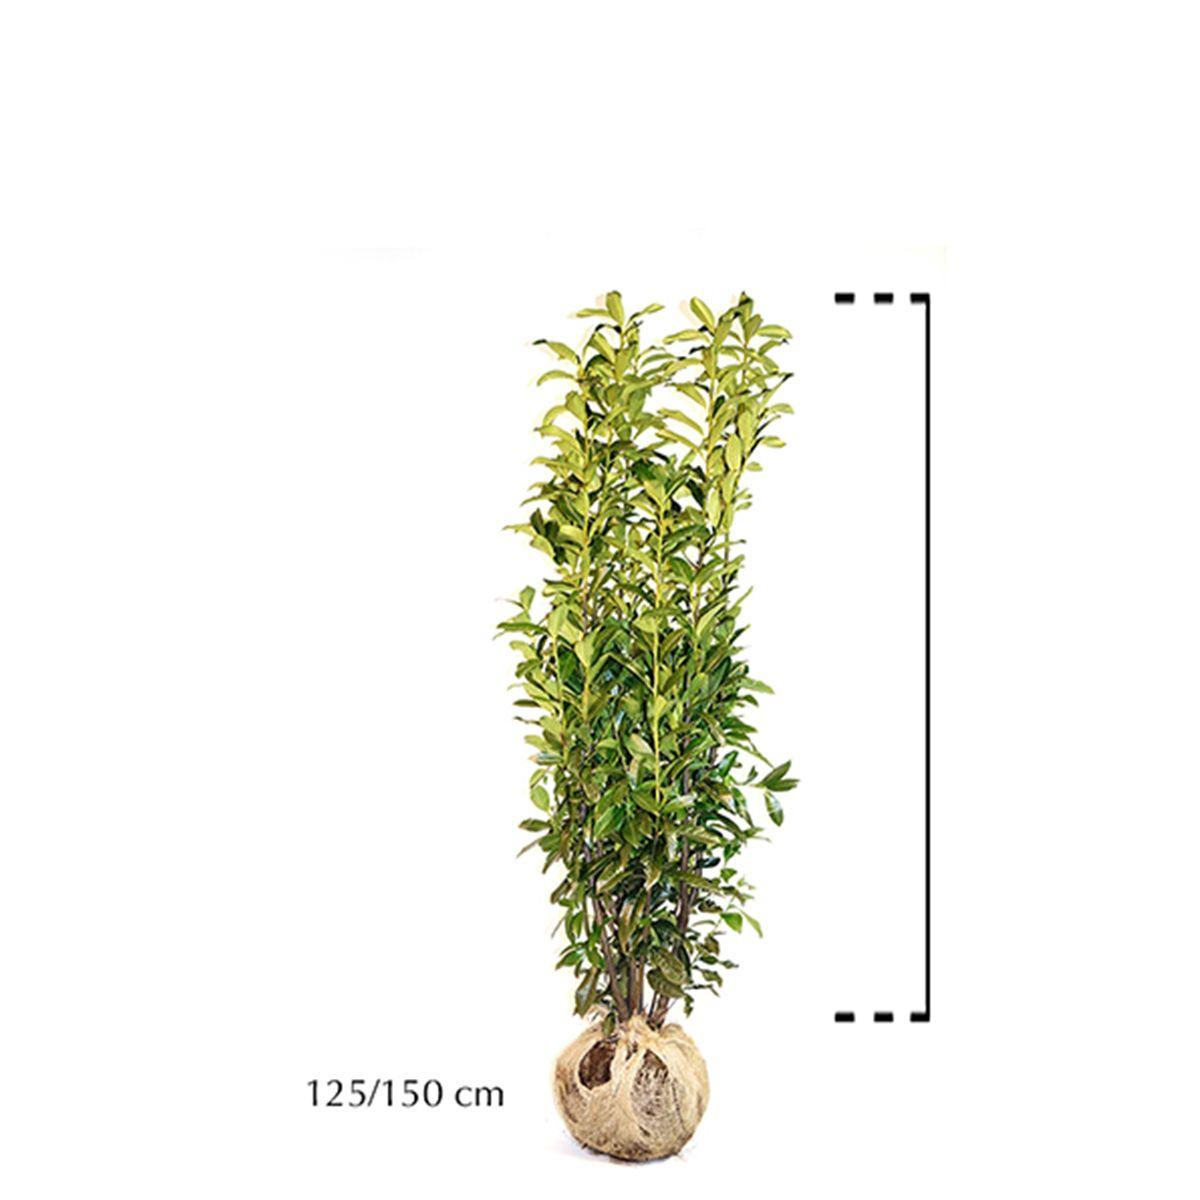 Laurier 'Genolia'® Kluit 125-150 cm Extra kwaliteit